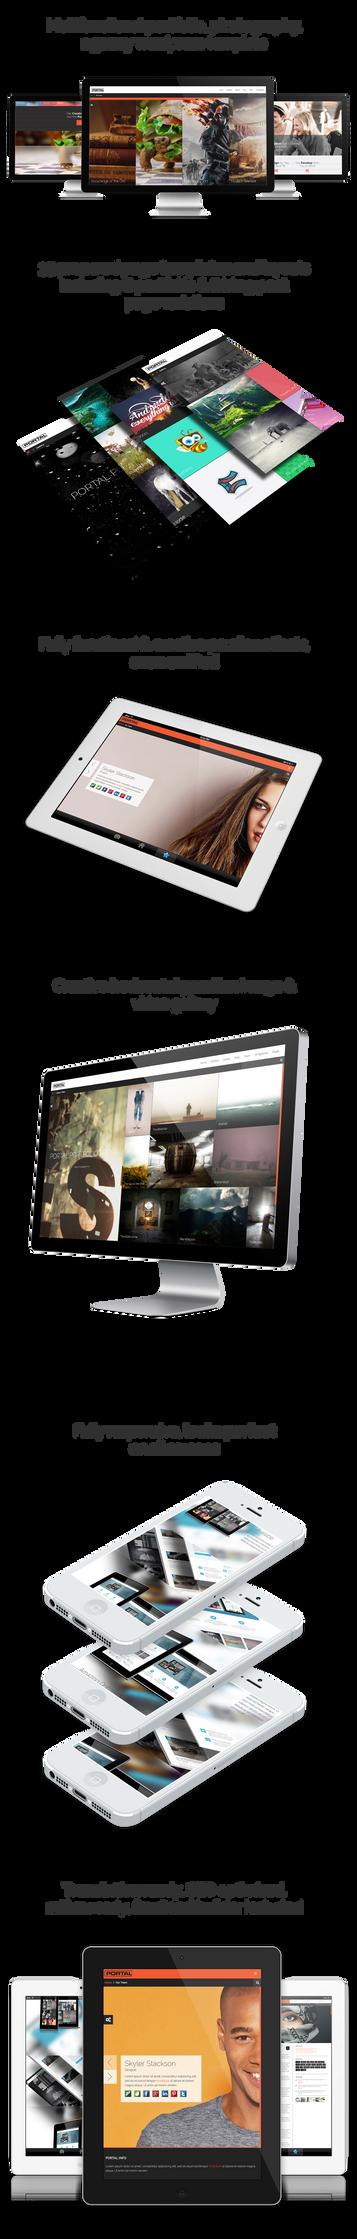 Portal - Multipurpose Wordpress Portfolio Template by ShindiriStudio